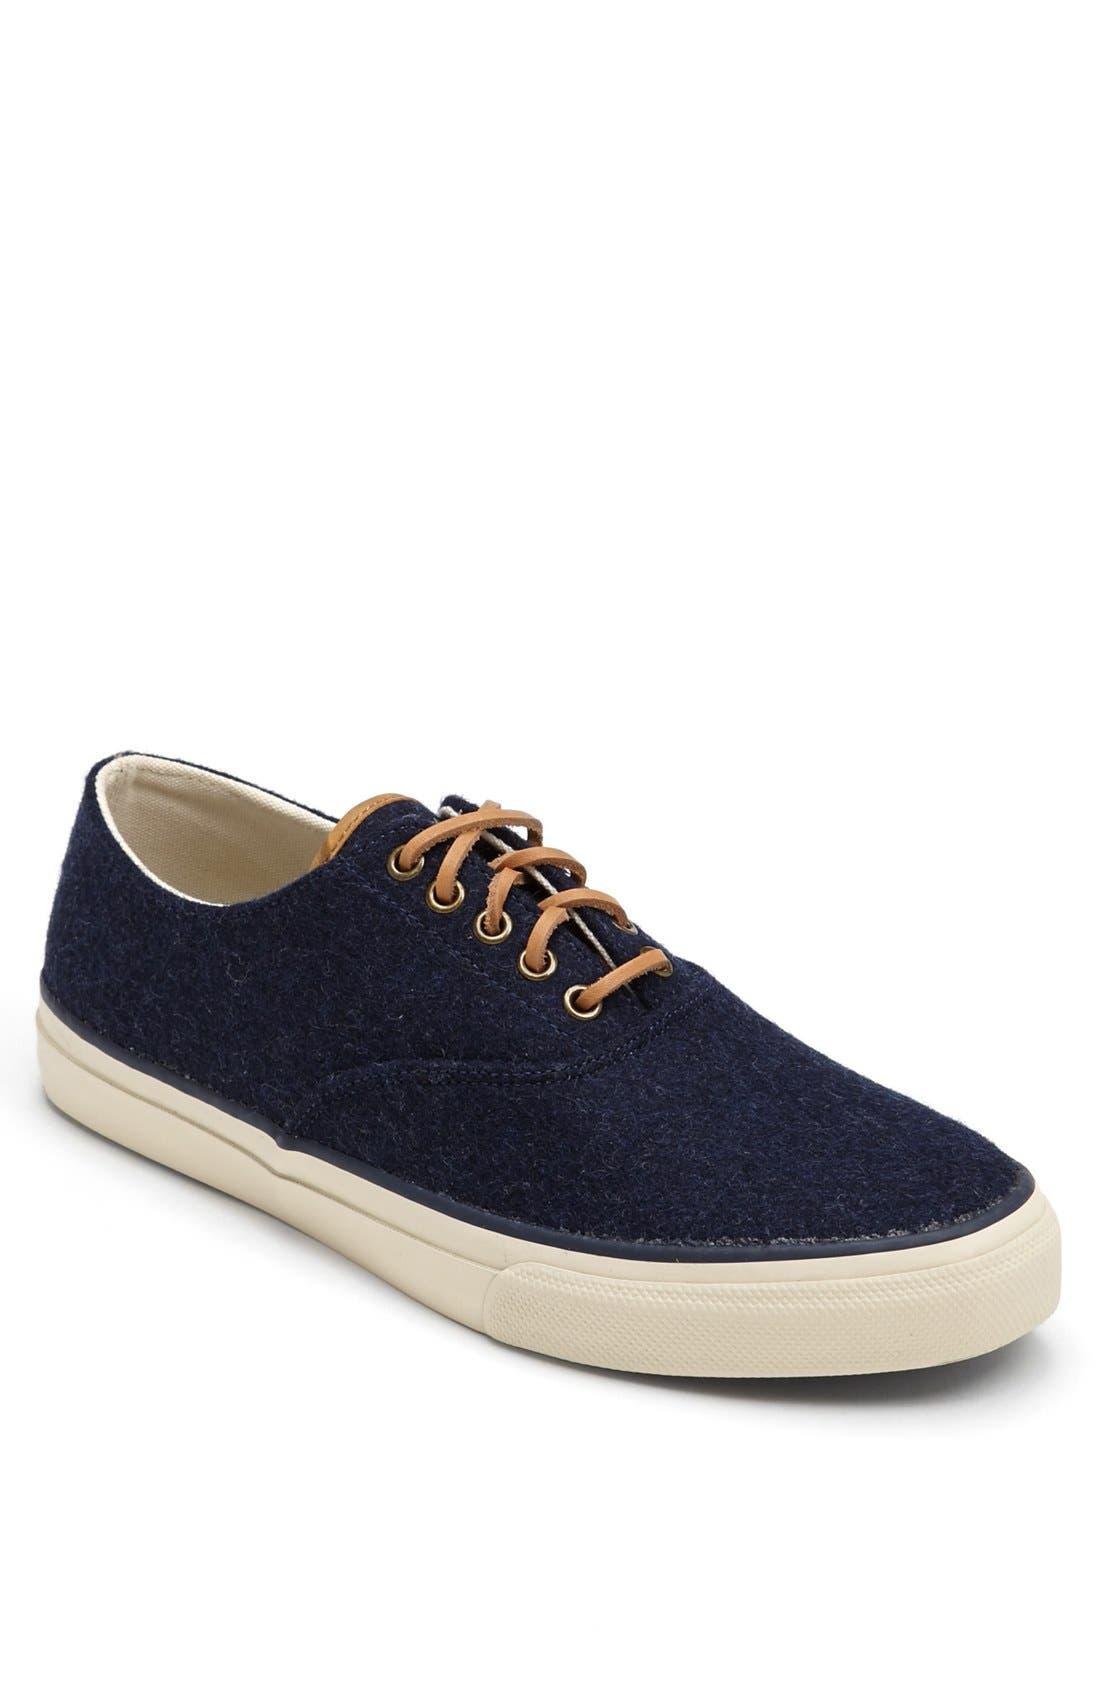 Alternate Image 1 Selected - Sperry Top-Sider® 'American Originals - CVO' Sneaker